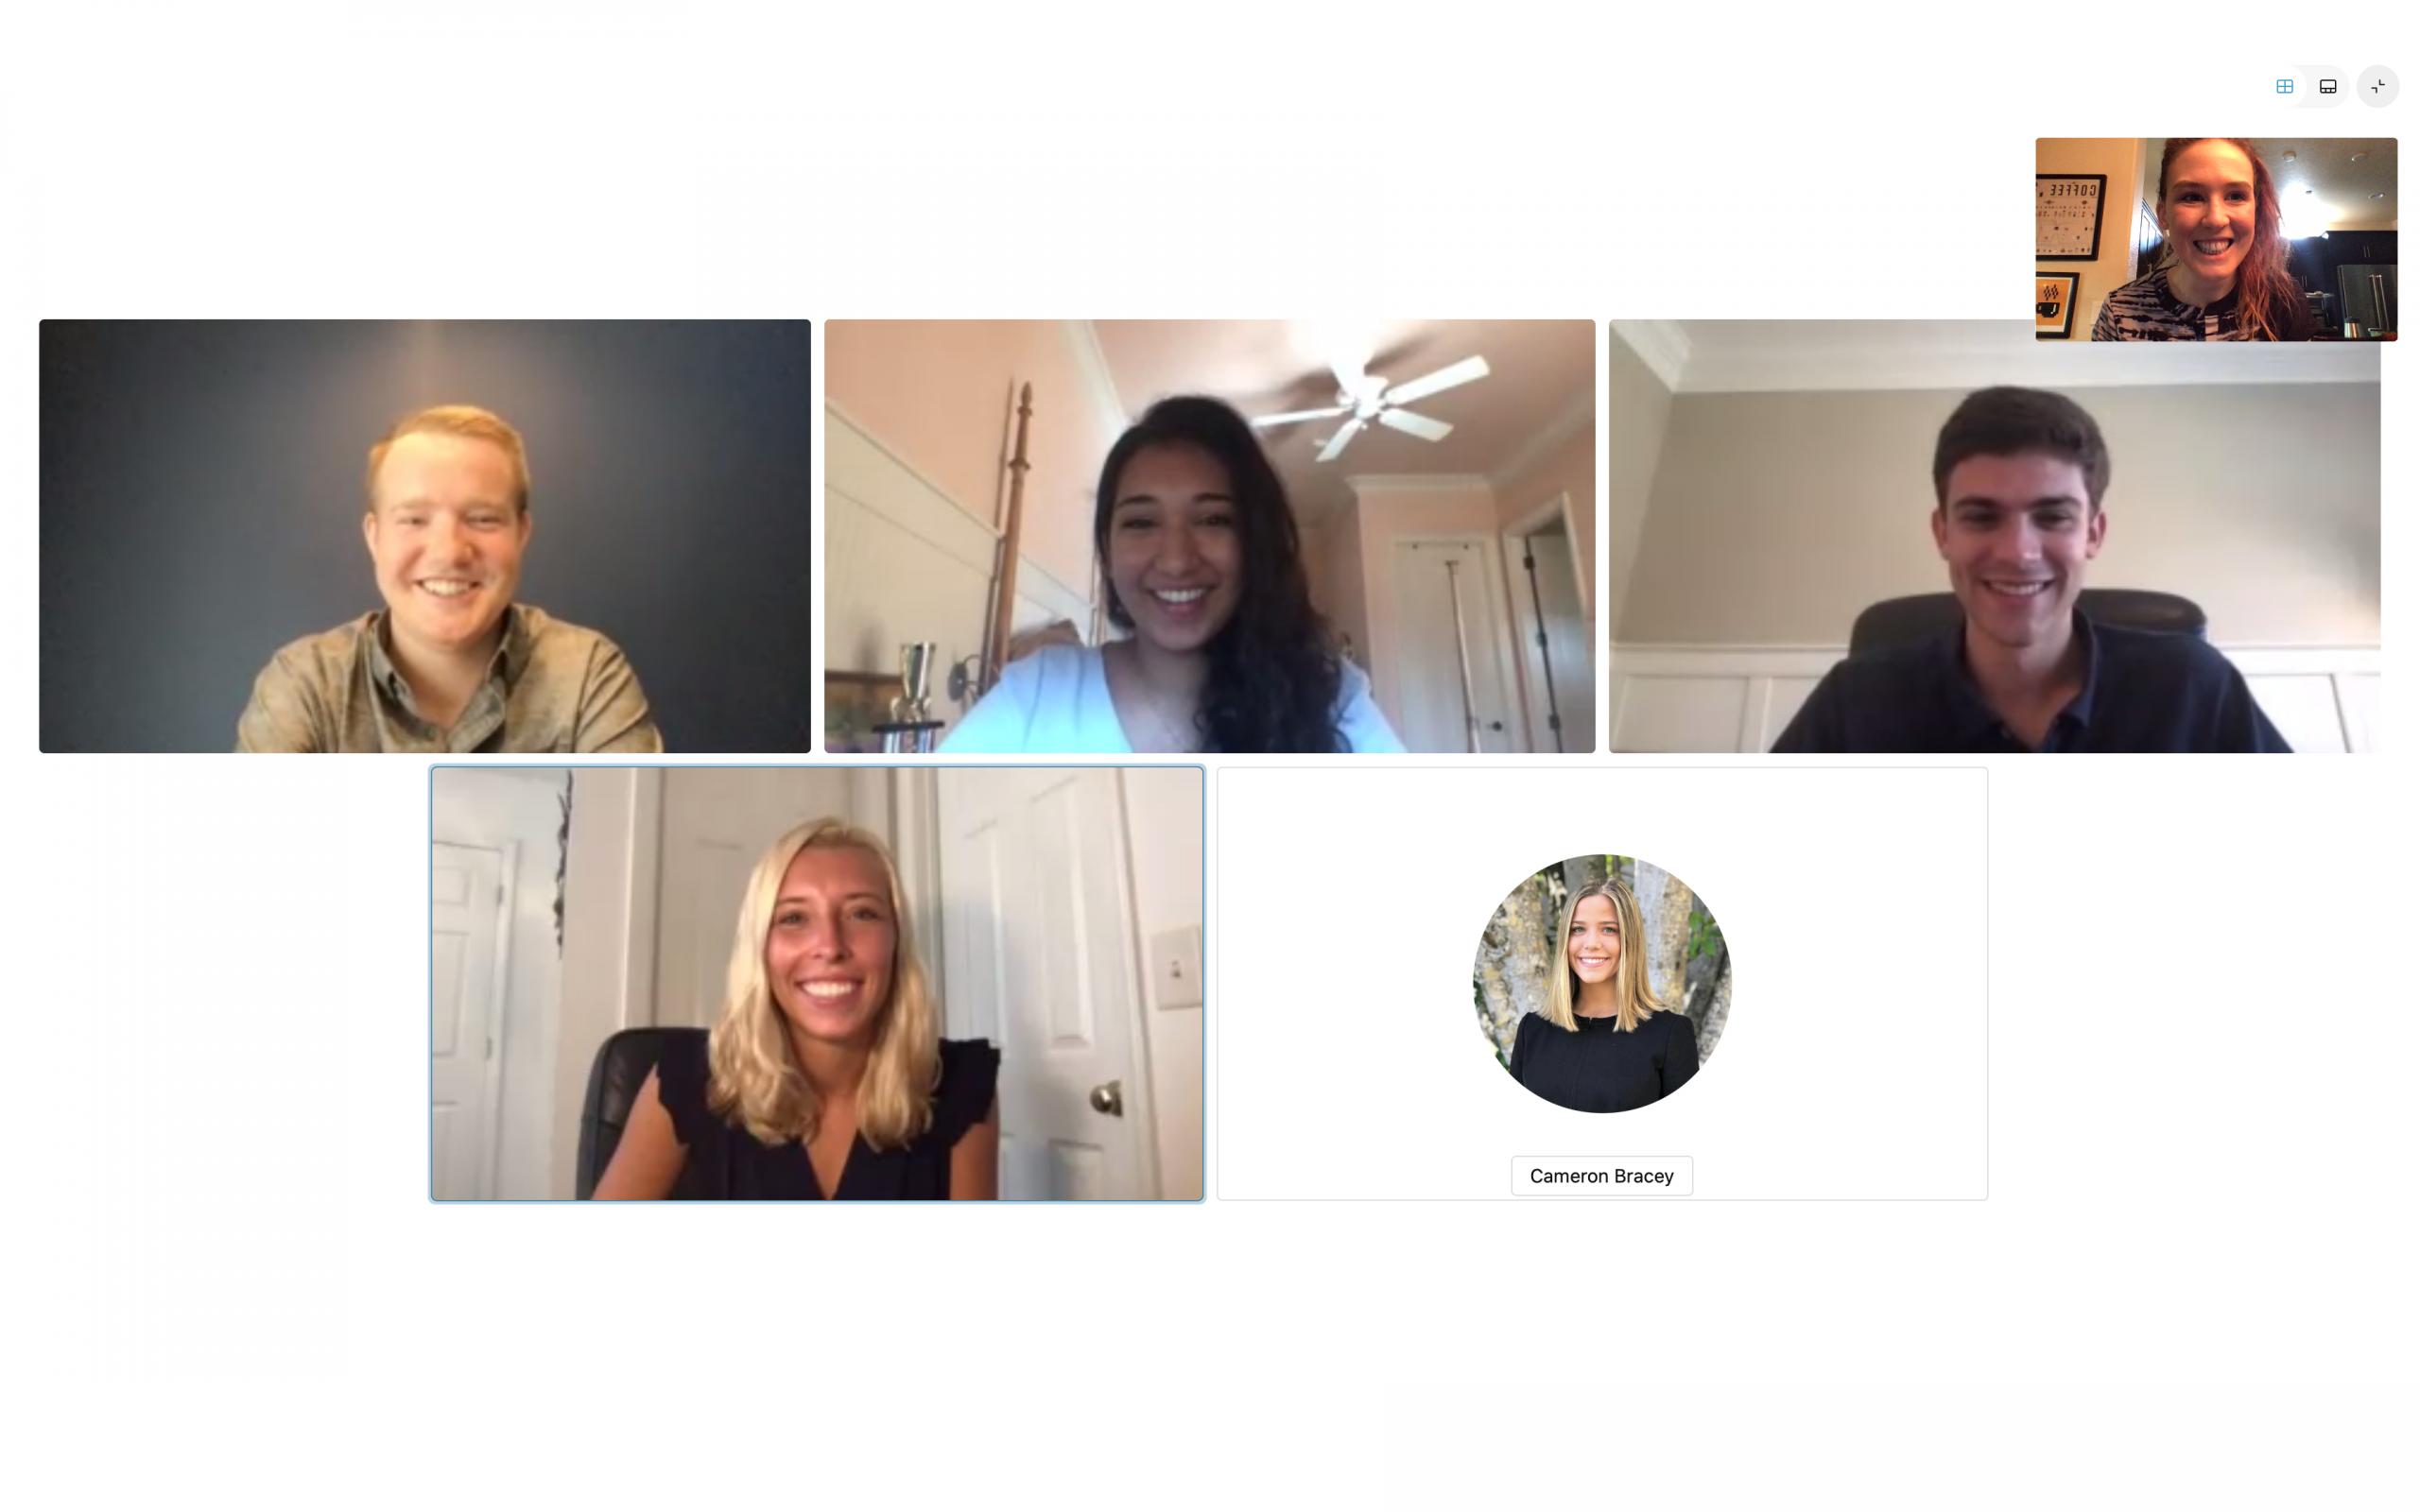 A screenshot of Courtney's peers on a Webex call.